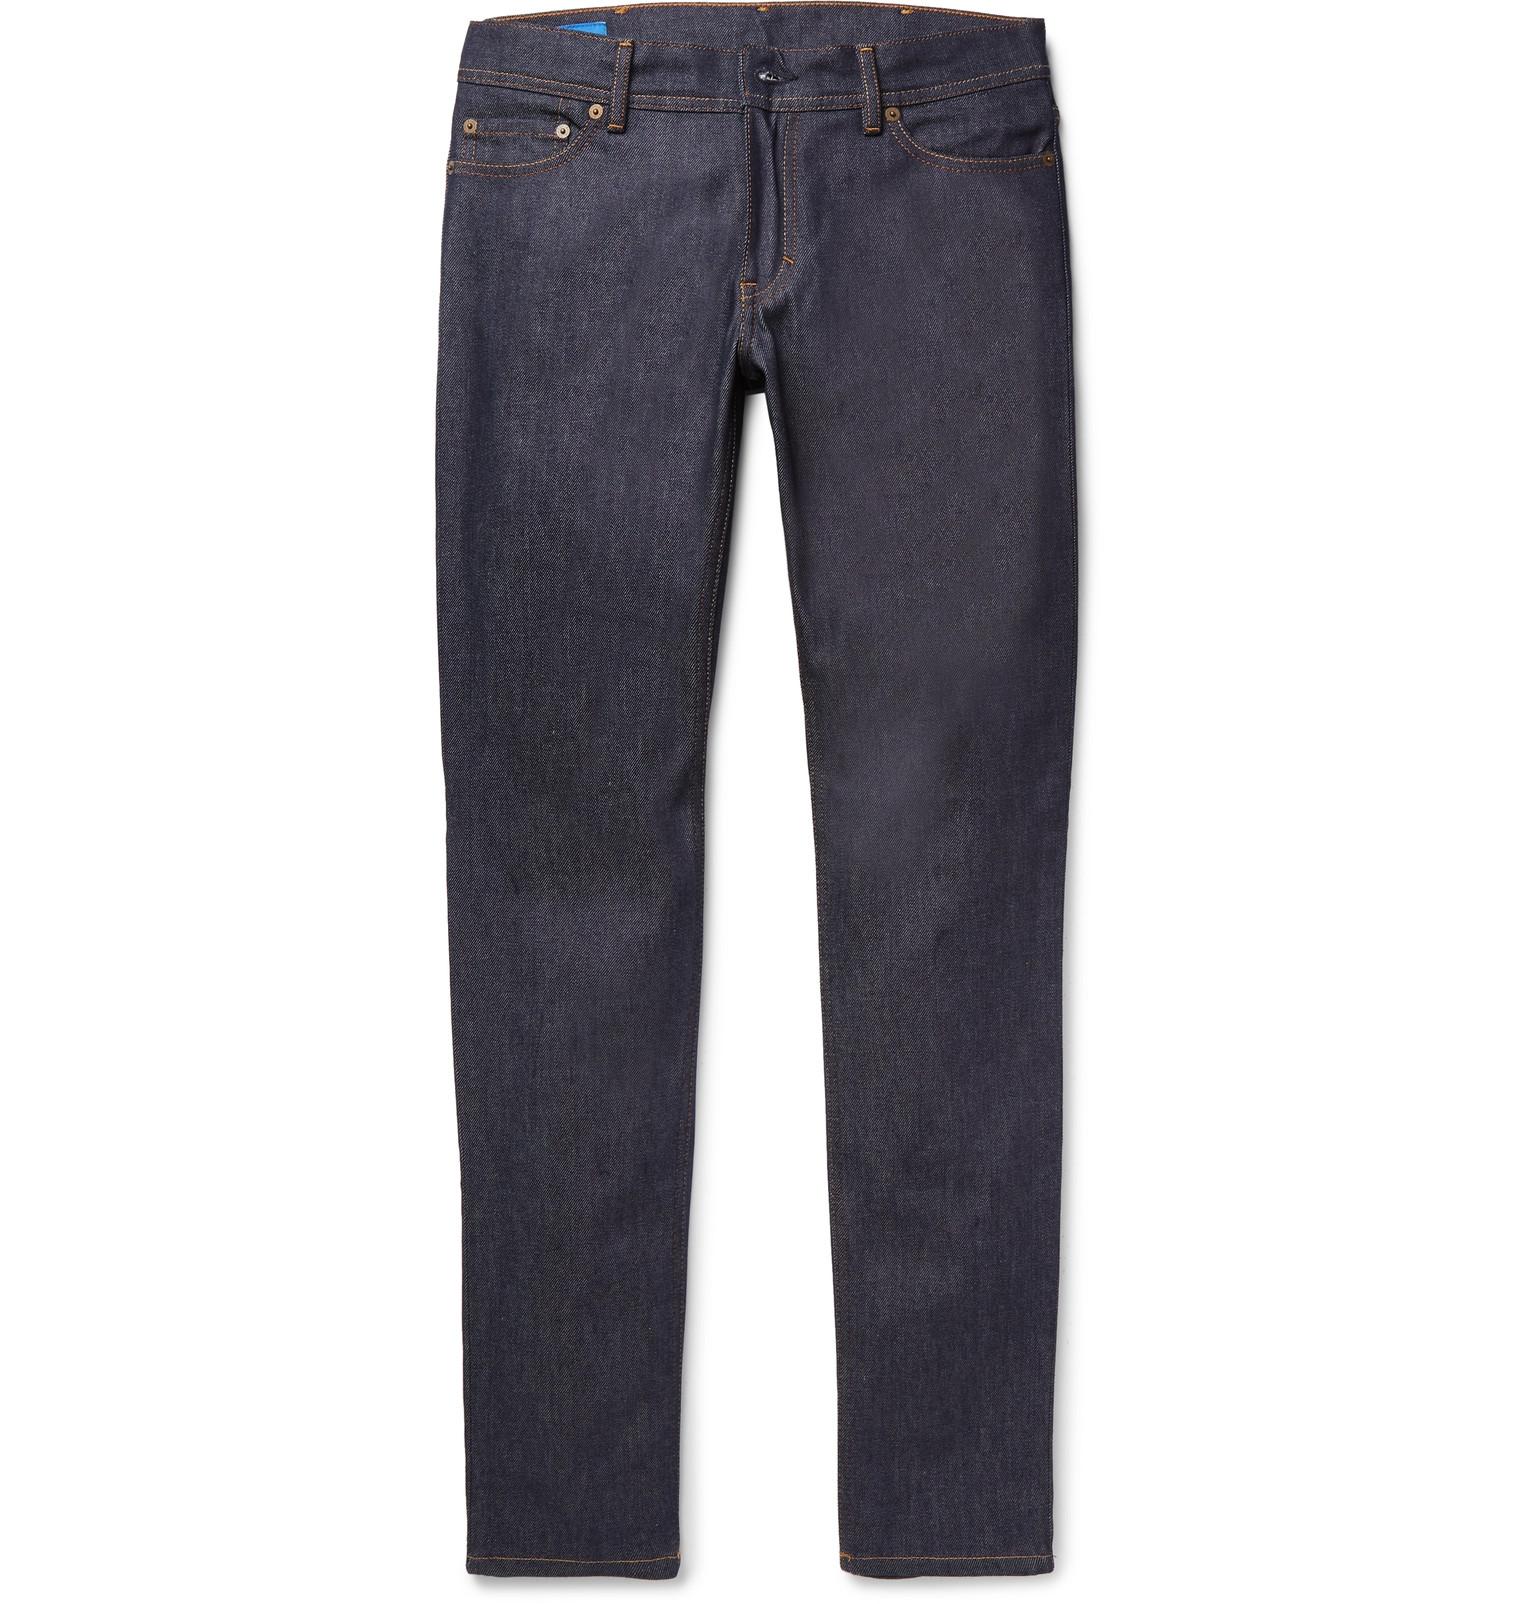 483b0a065637 Acne Studios - North Slim-Fit Denim Jeans